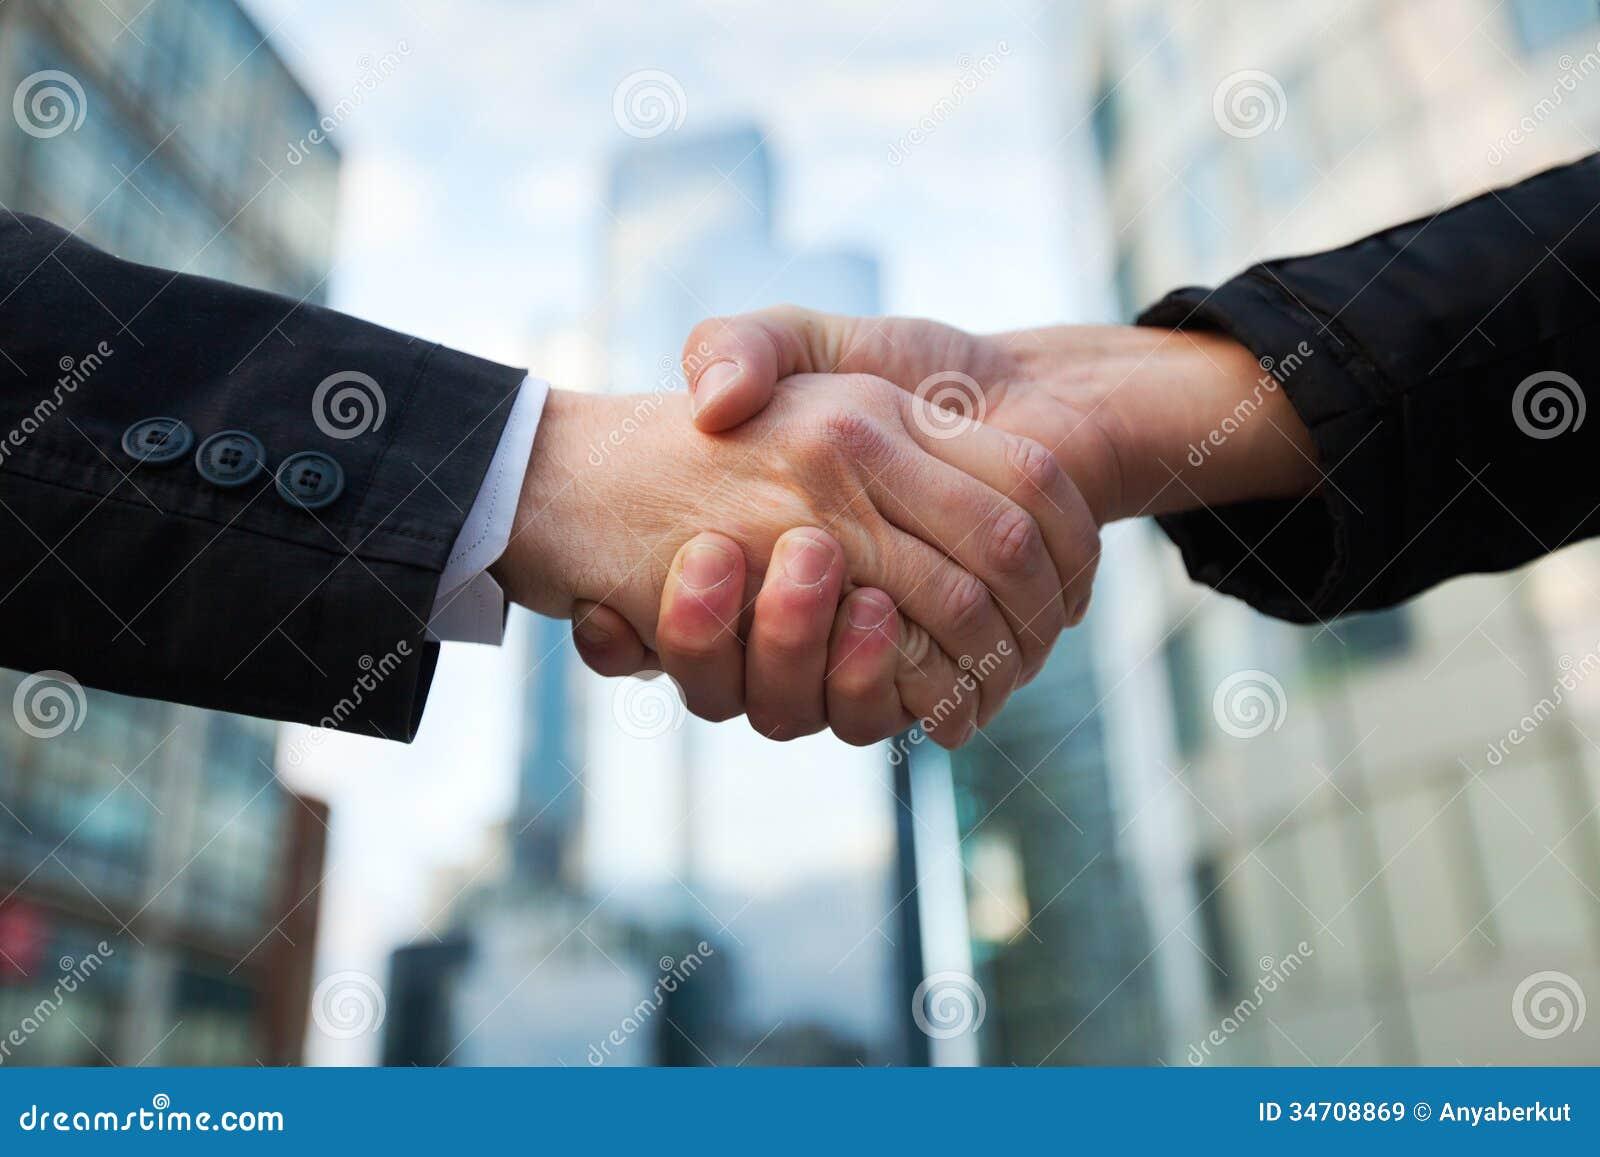 Business people handshake greeting deal at work photo free download - Buildings Business Handshake